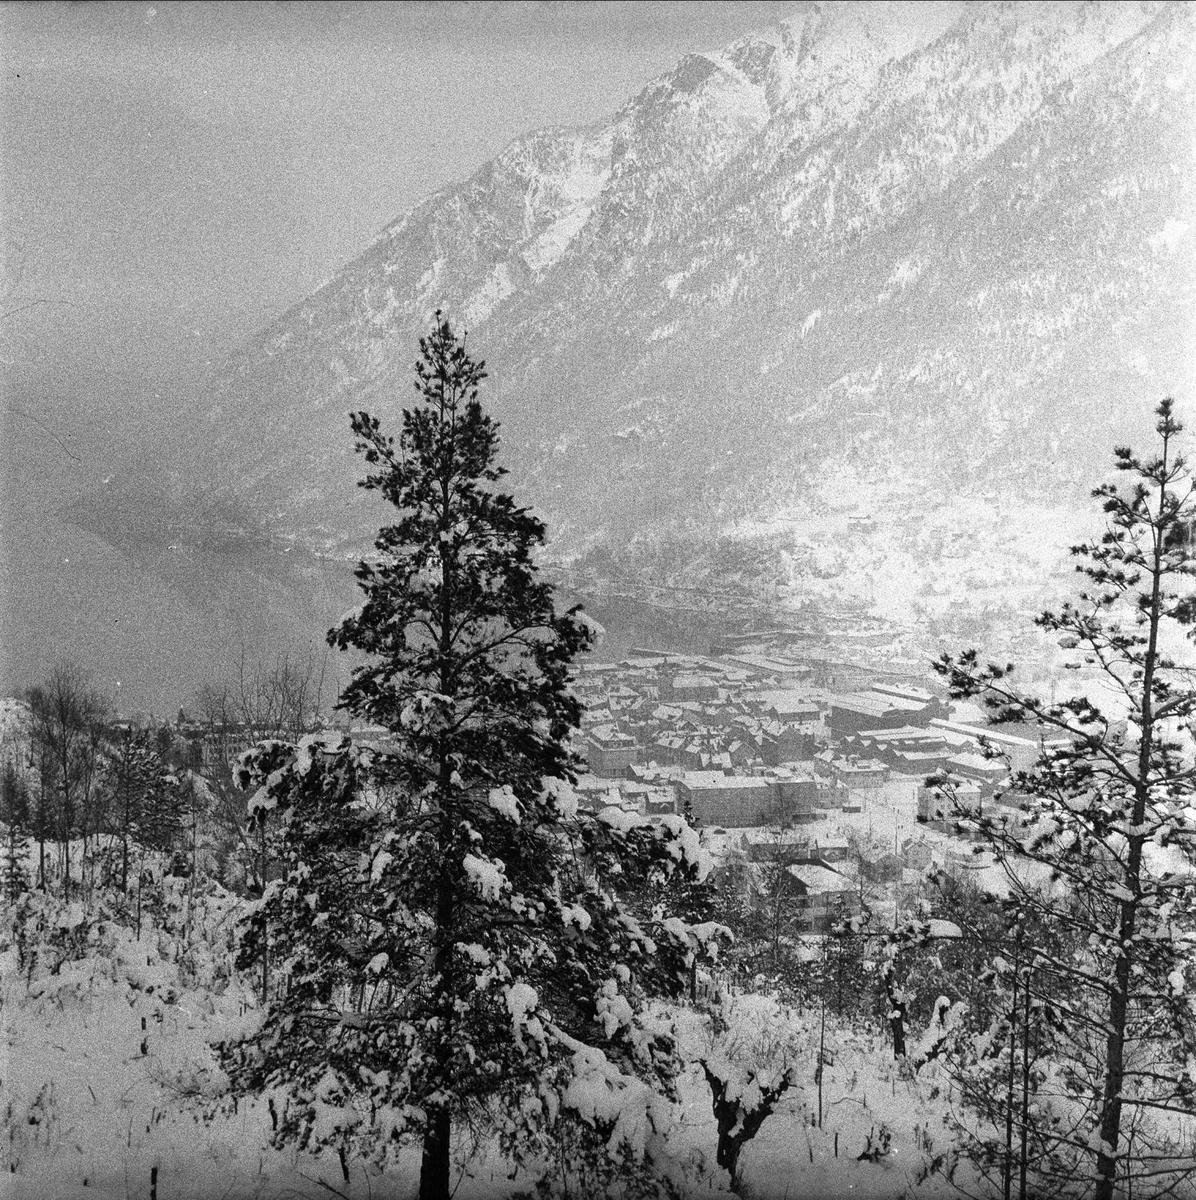 Odda, Hordaland, mars 1957. Skog.